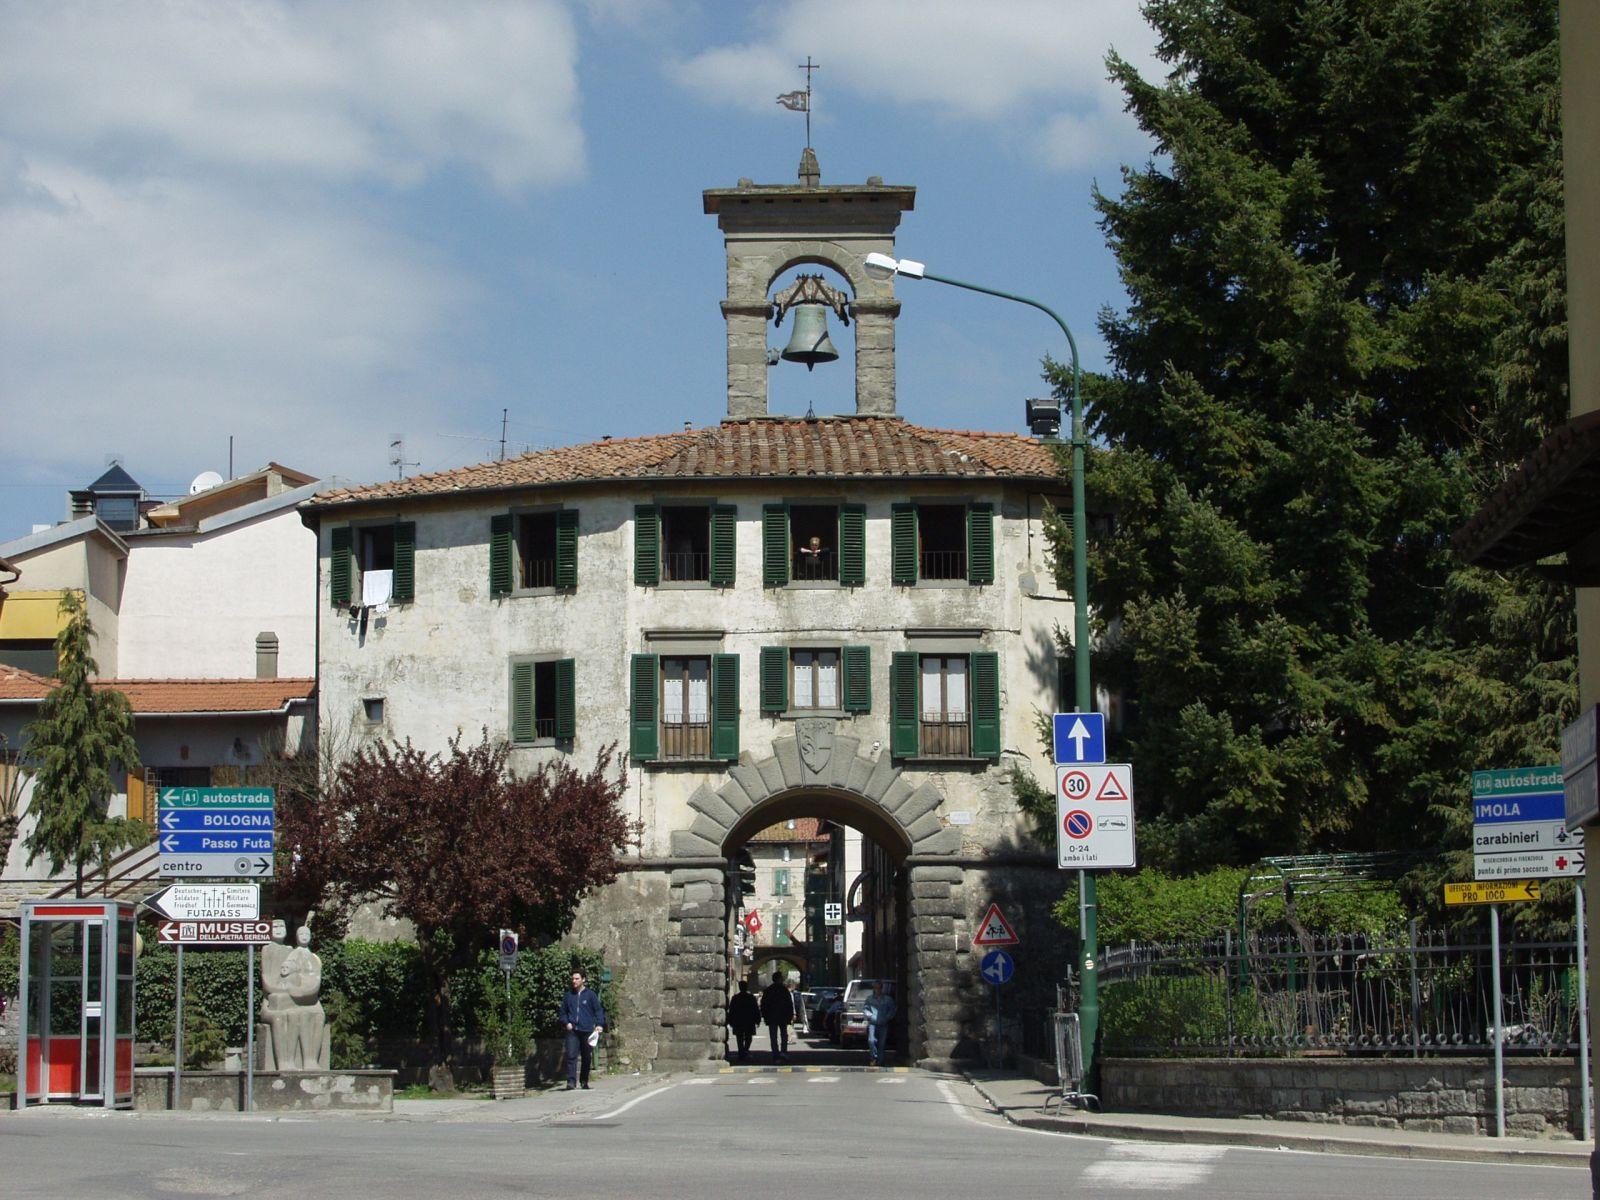 Firenzuola - Firenzuola terra di mezzo - Tuscany, Beautiful Everywhere